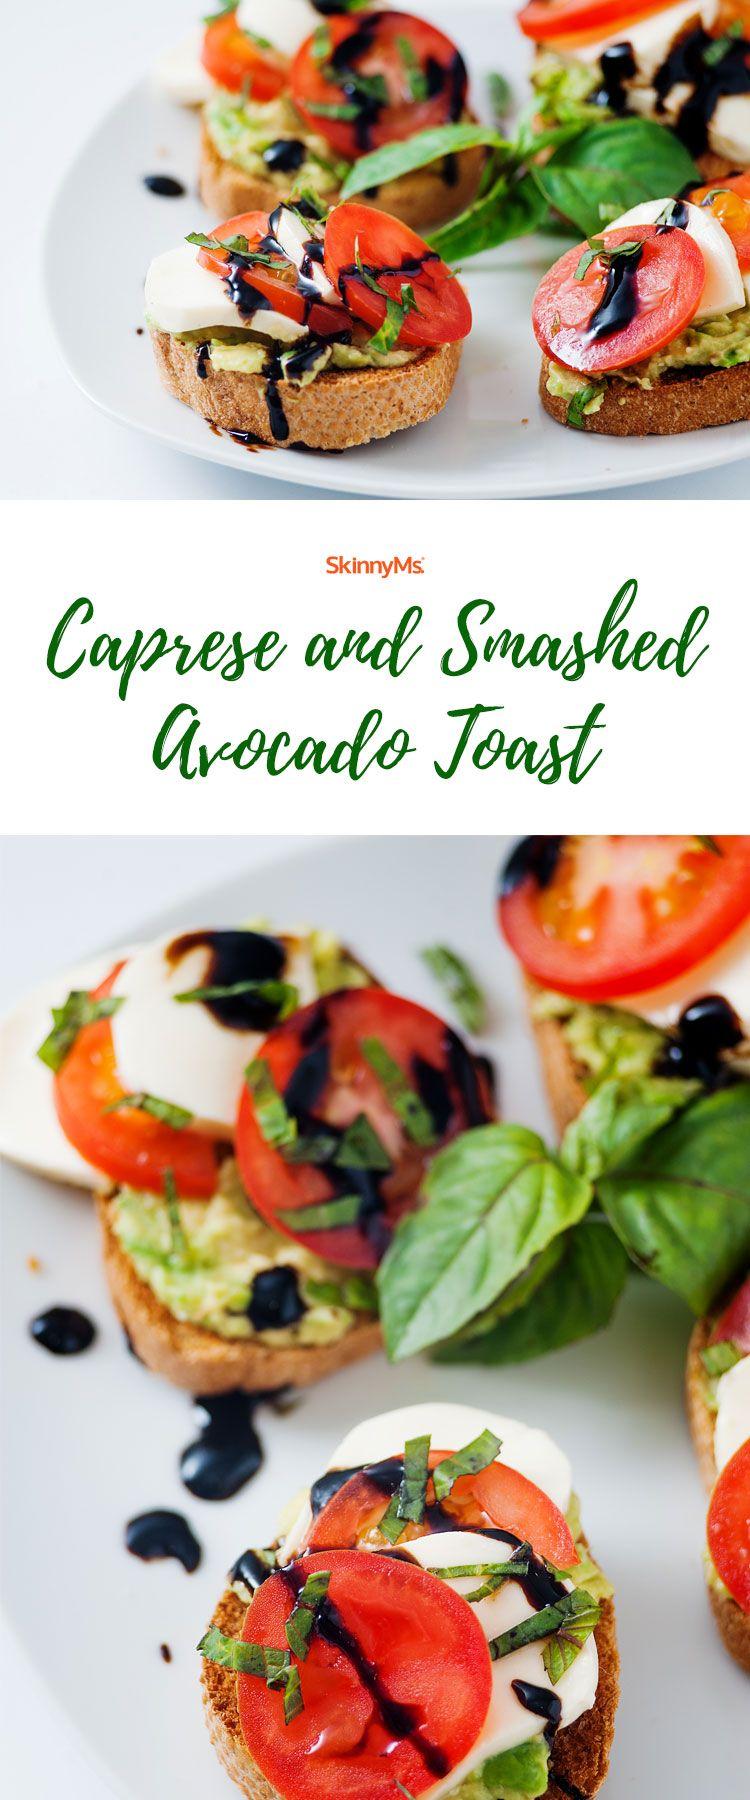 Caprese and Smashed Avocado Toast